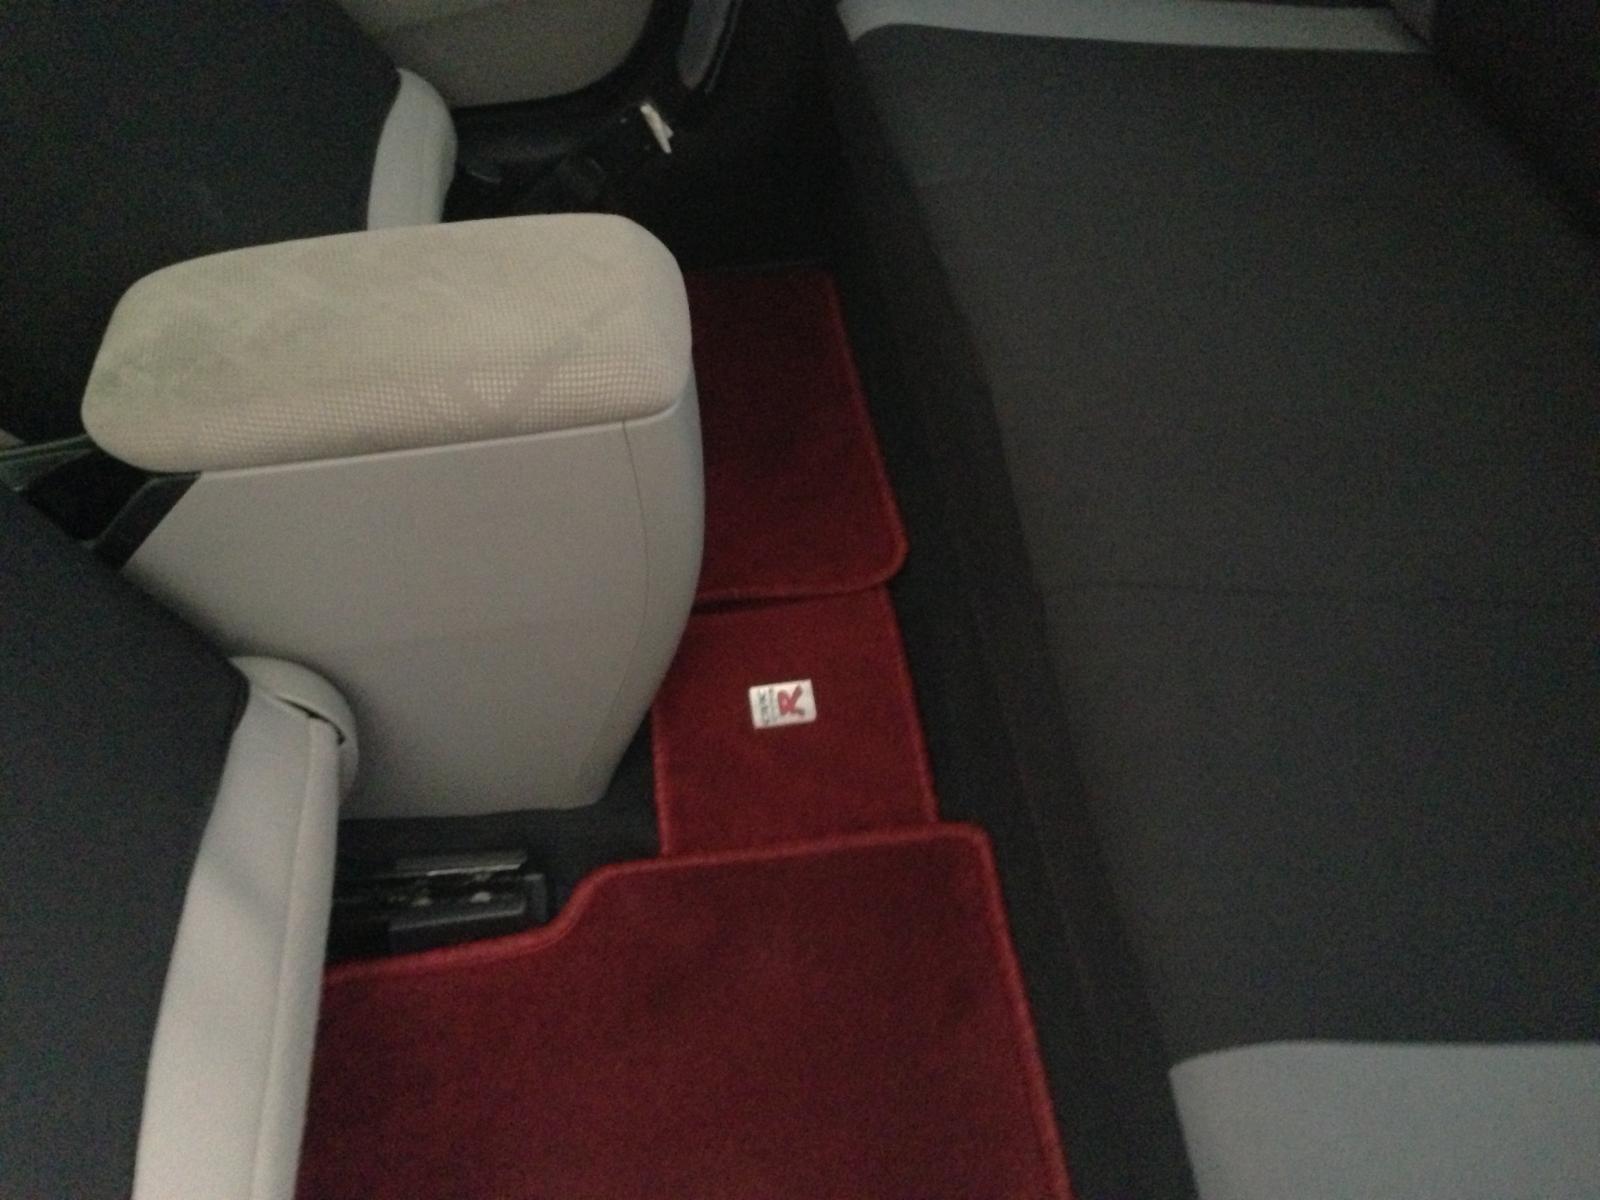 Floor mats for honda civic -  Civic Type R Floor Mats Red Photo 7 Jpg